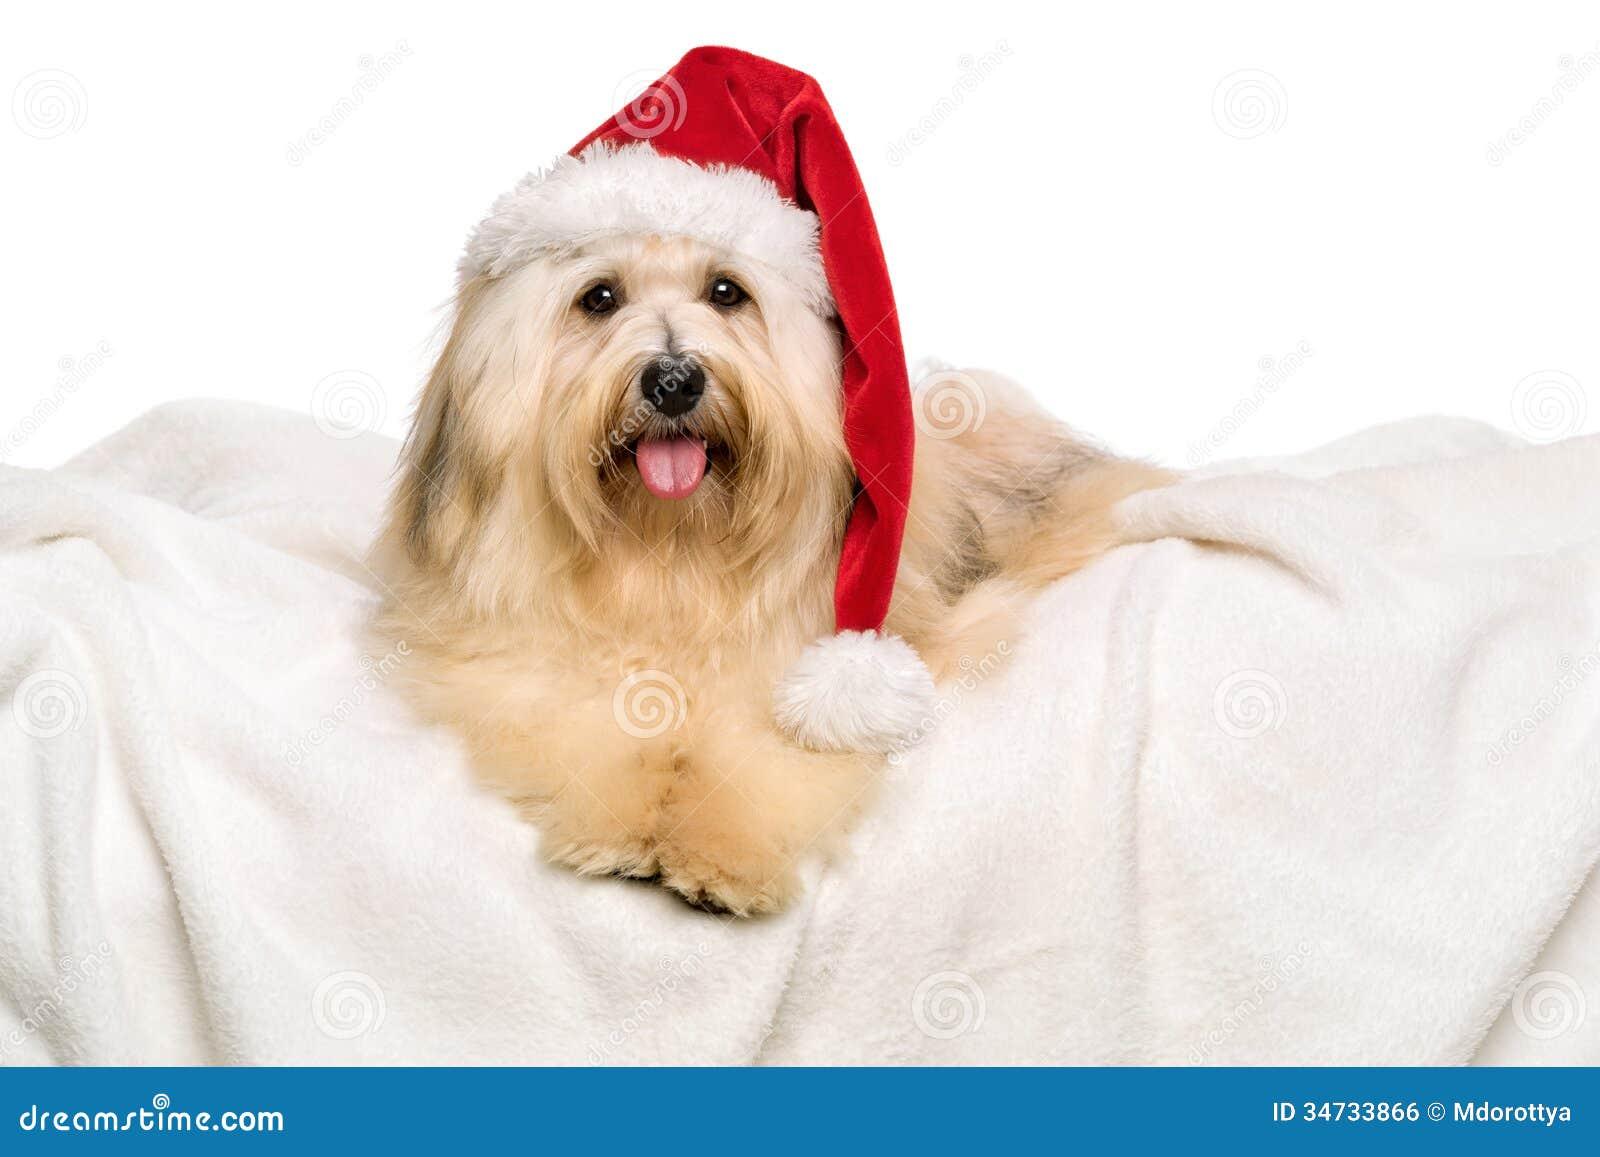 Cute Reddish Christmas Havanese Dog On A White Blanket